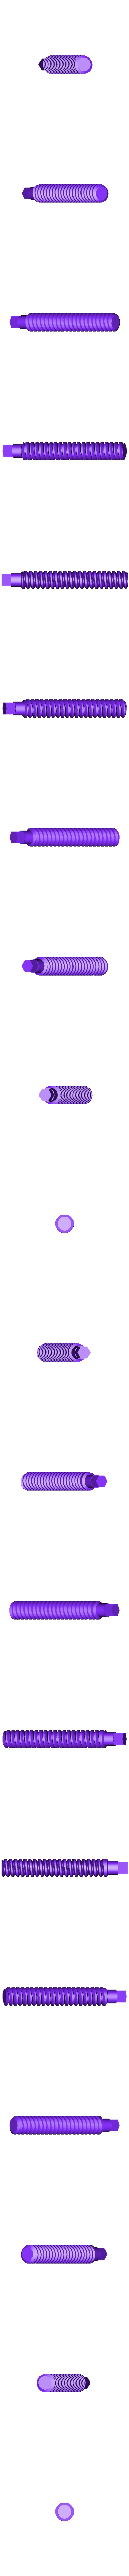 Filament-Spool-Mount-Universal_-_Screw.stl Download free STL file Filament Spool Holder - Bearings and custom width • 3D print design, csigshoj